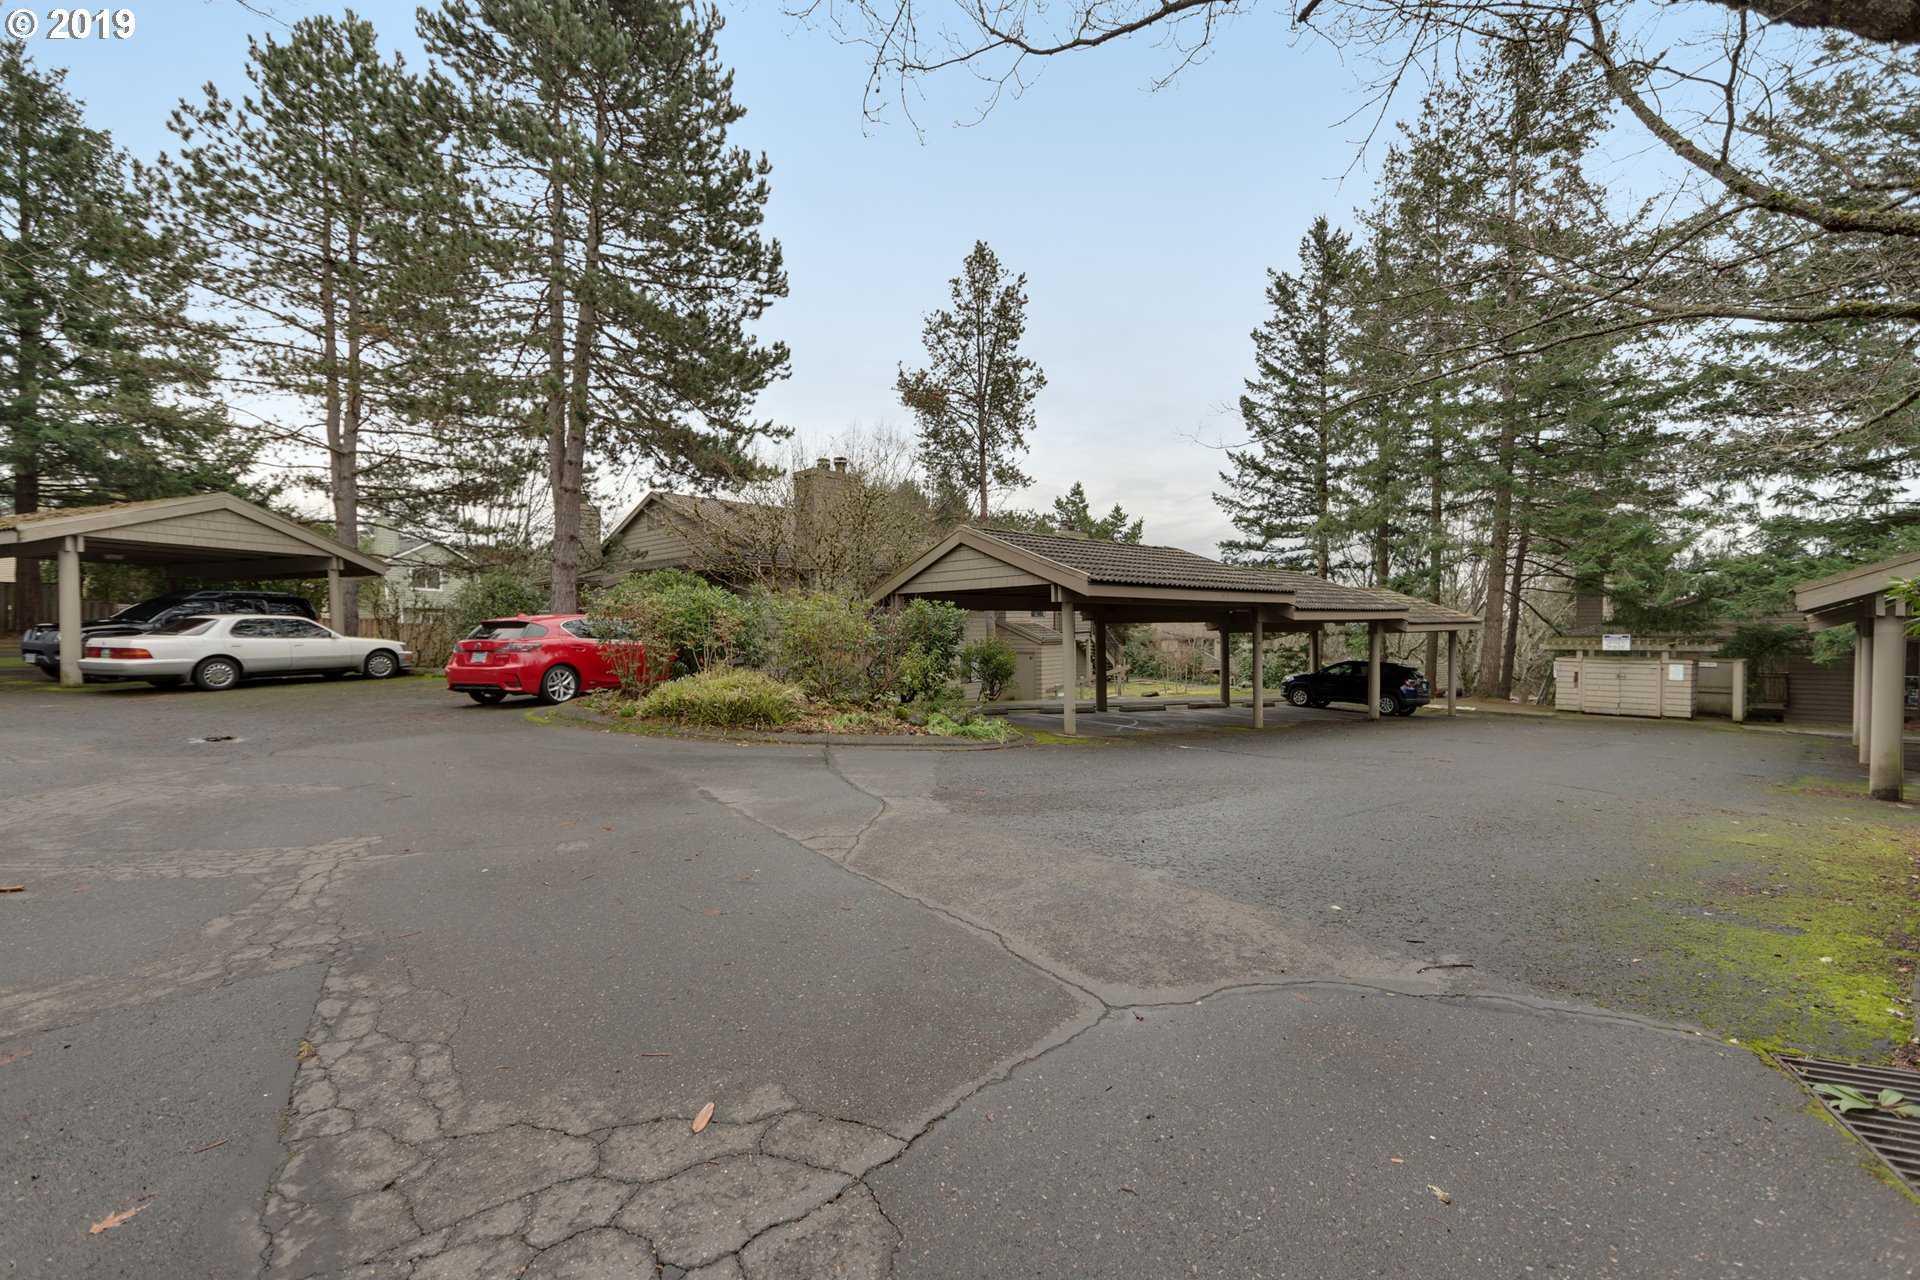 $223,800 - 2Br/1Ba -  for Sale in Kingsgate, Lake Oswego